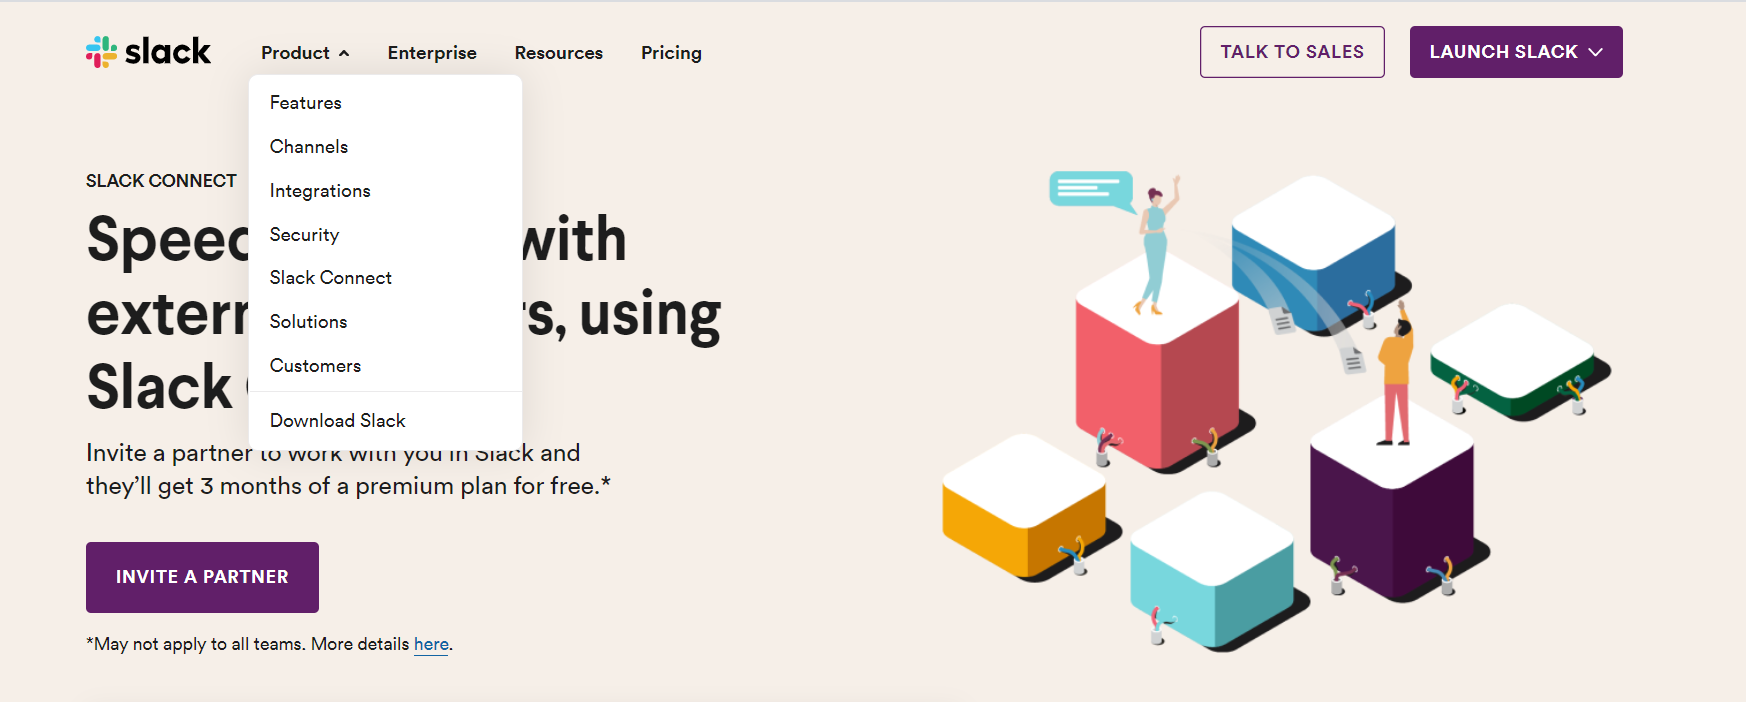 usability of Slack's website design